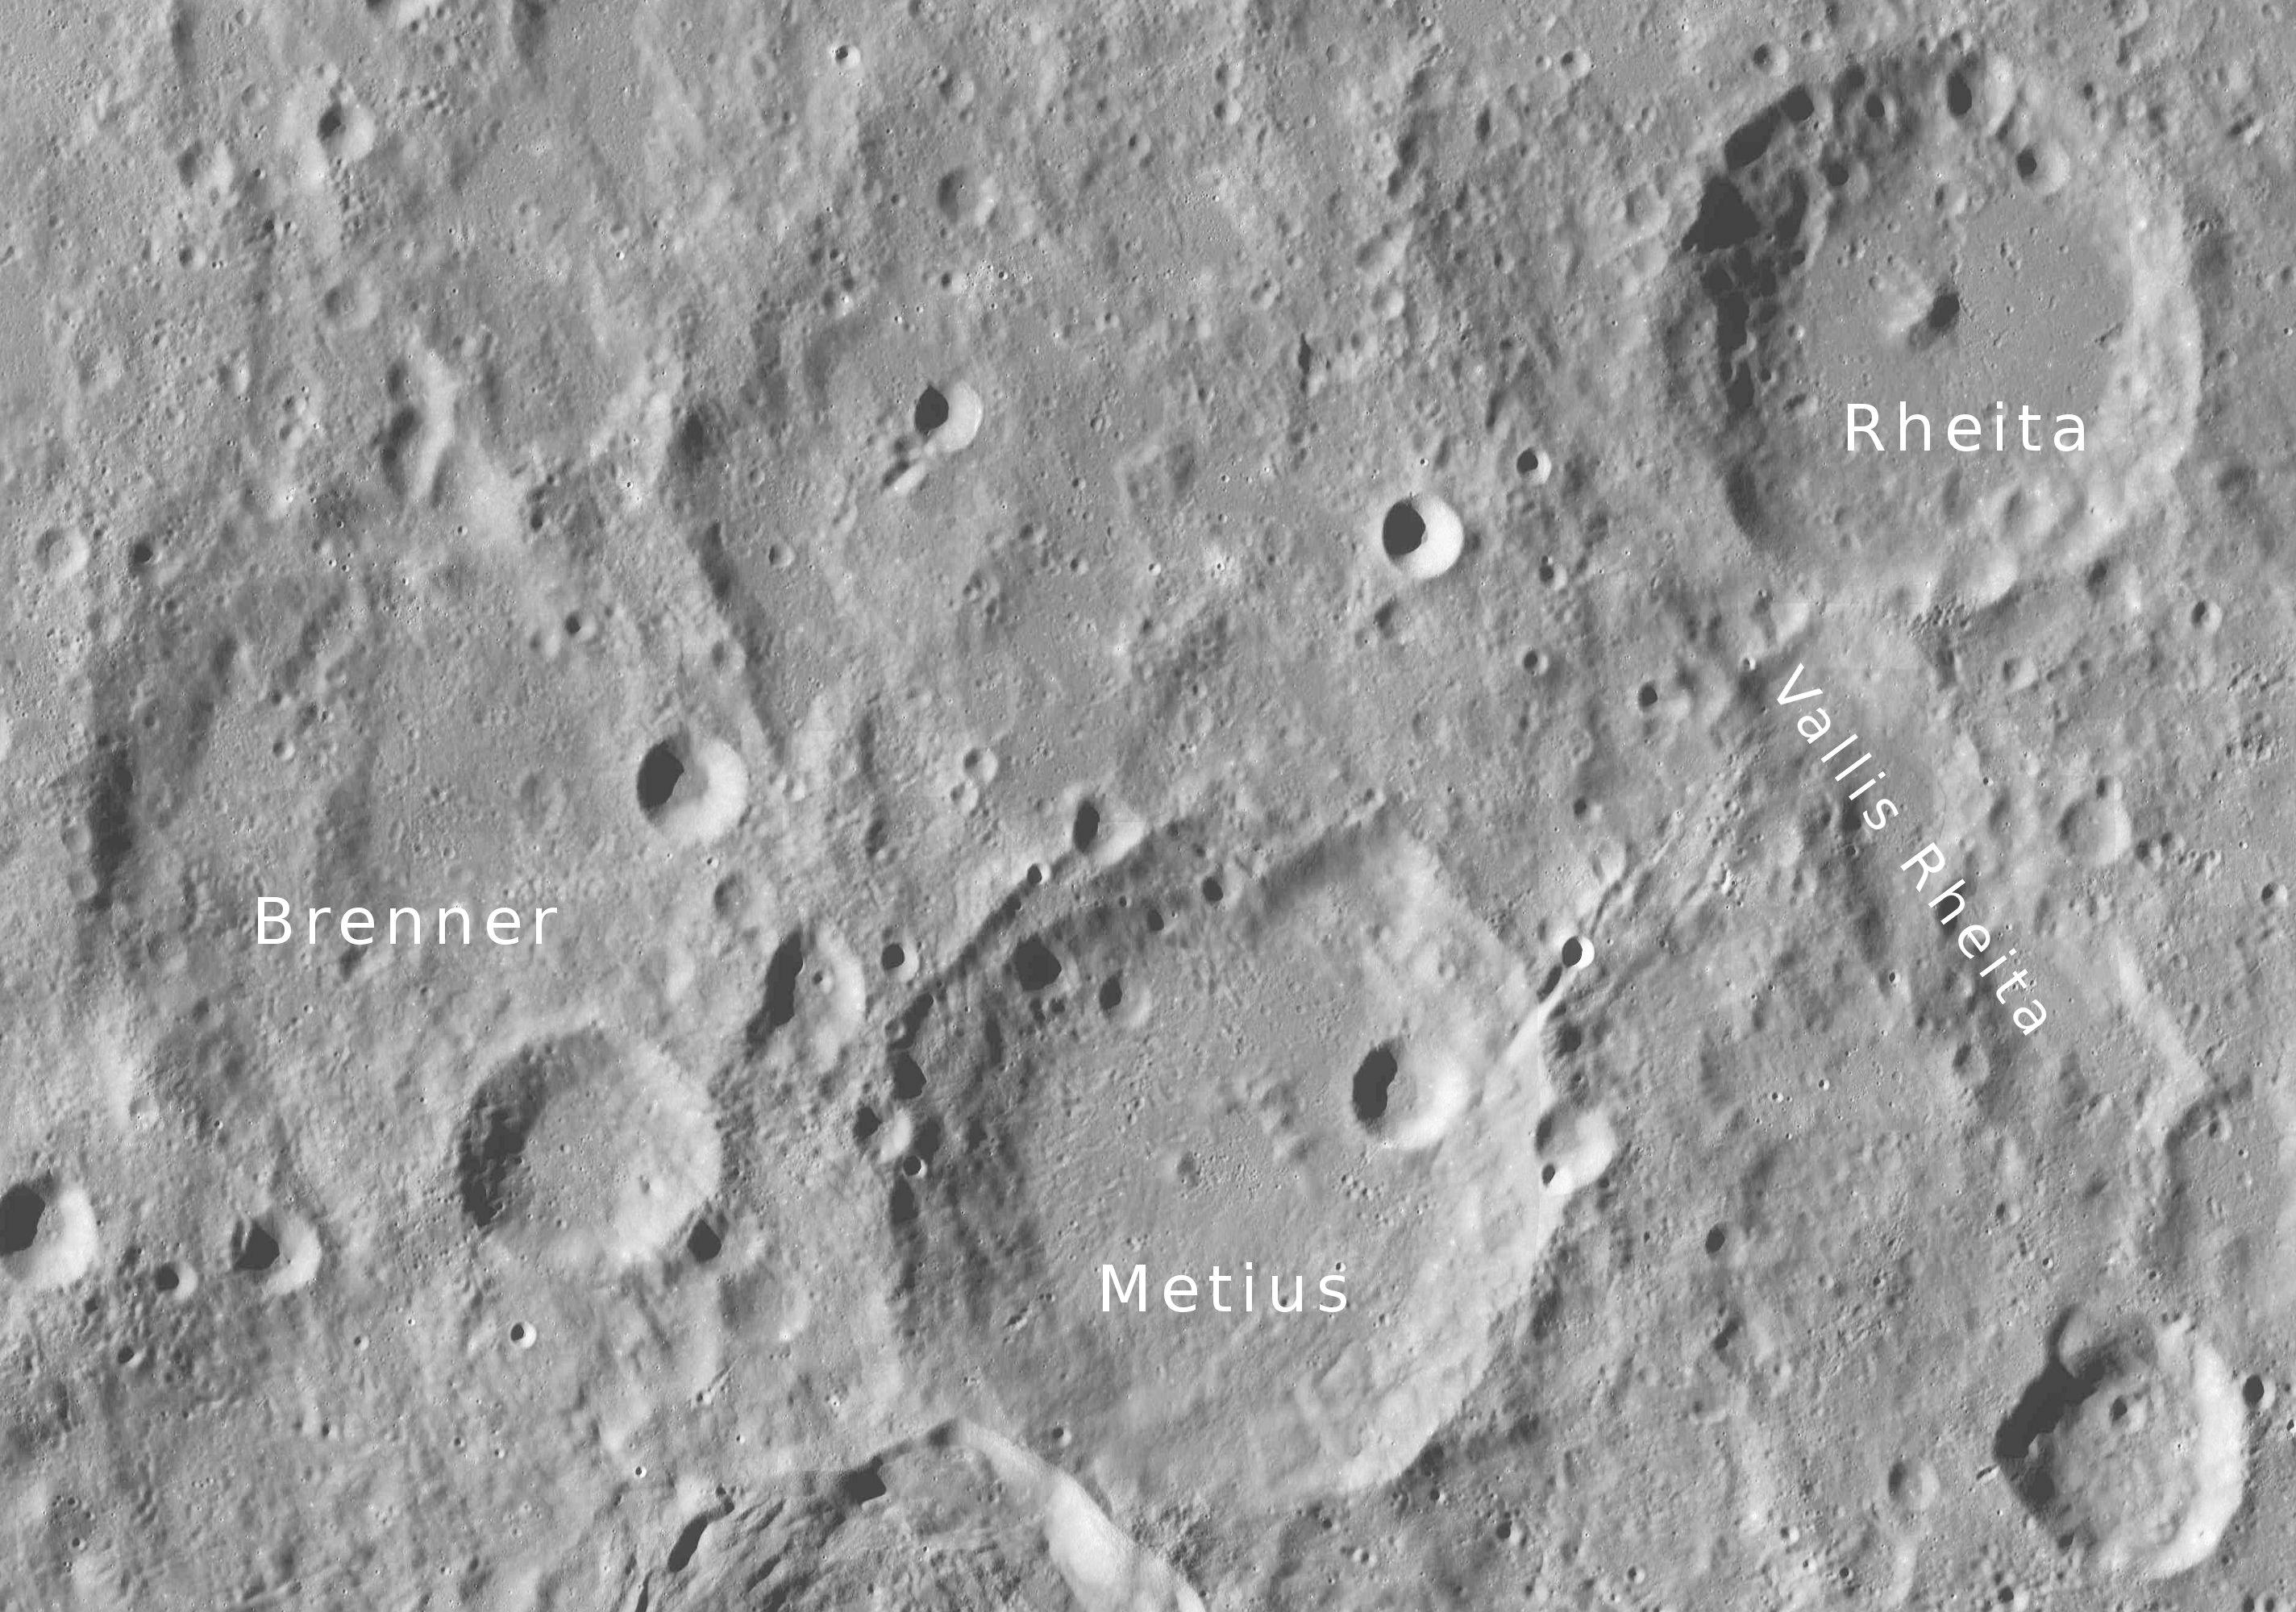 Brenner + Metius + Rheita - LROC - WAC.JPG